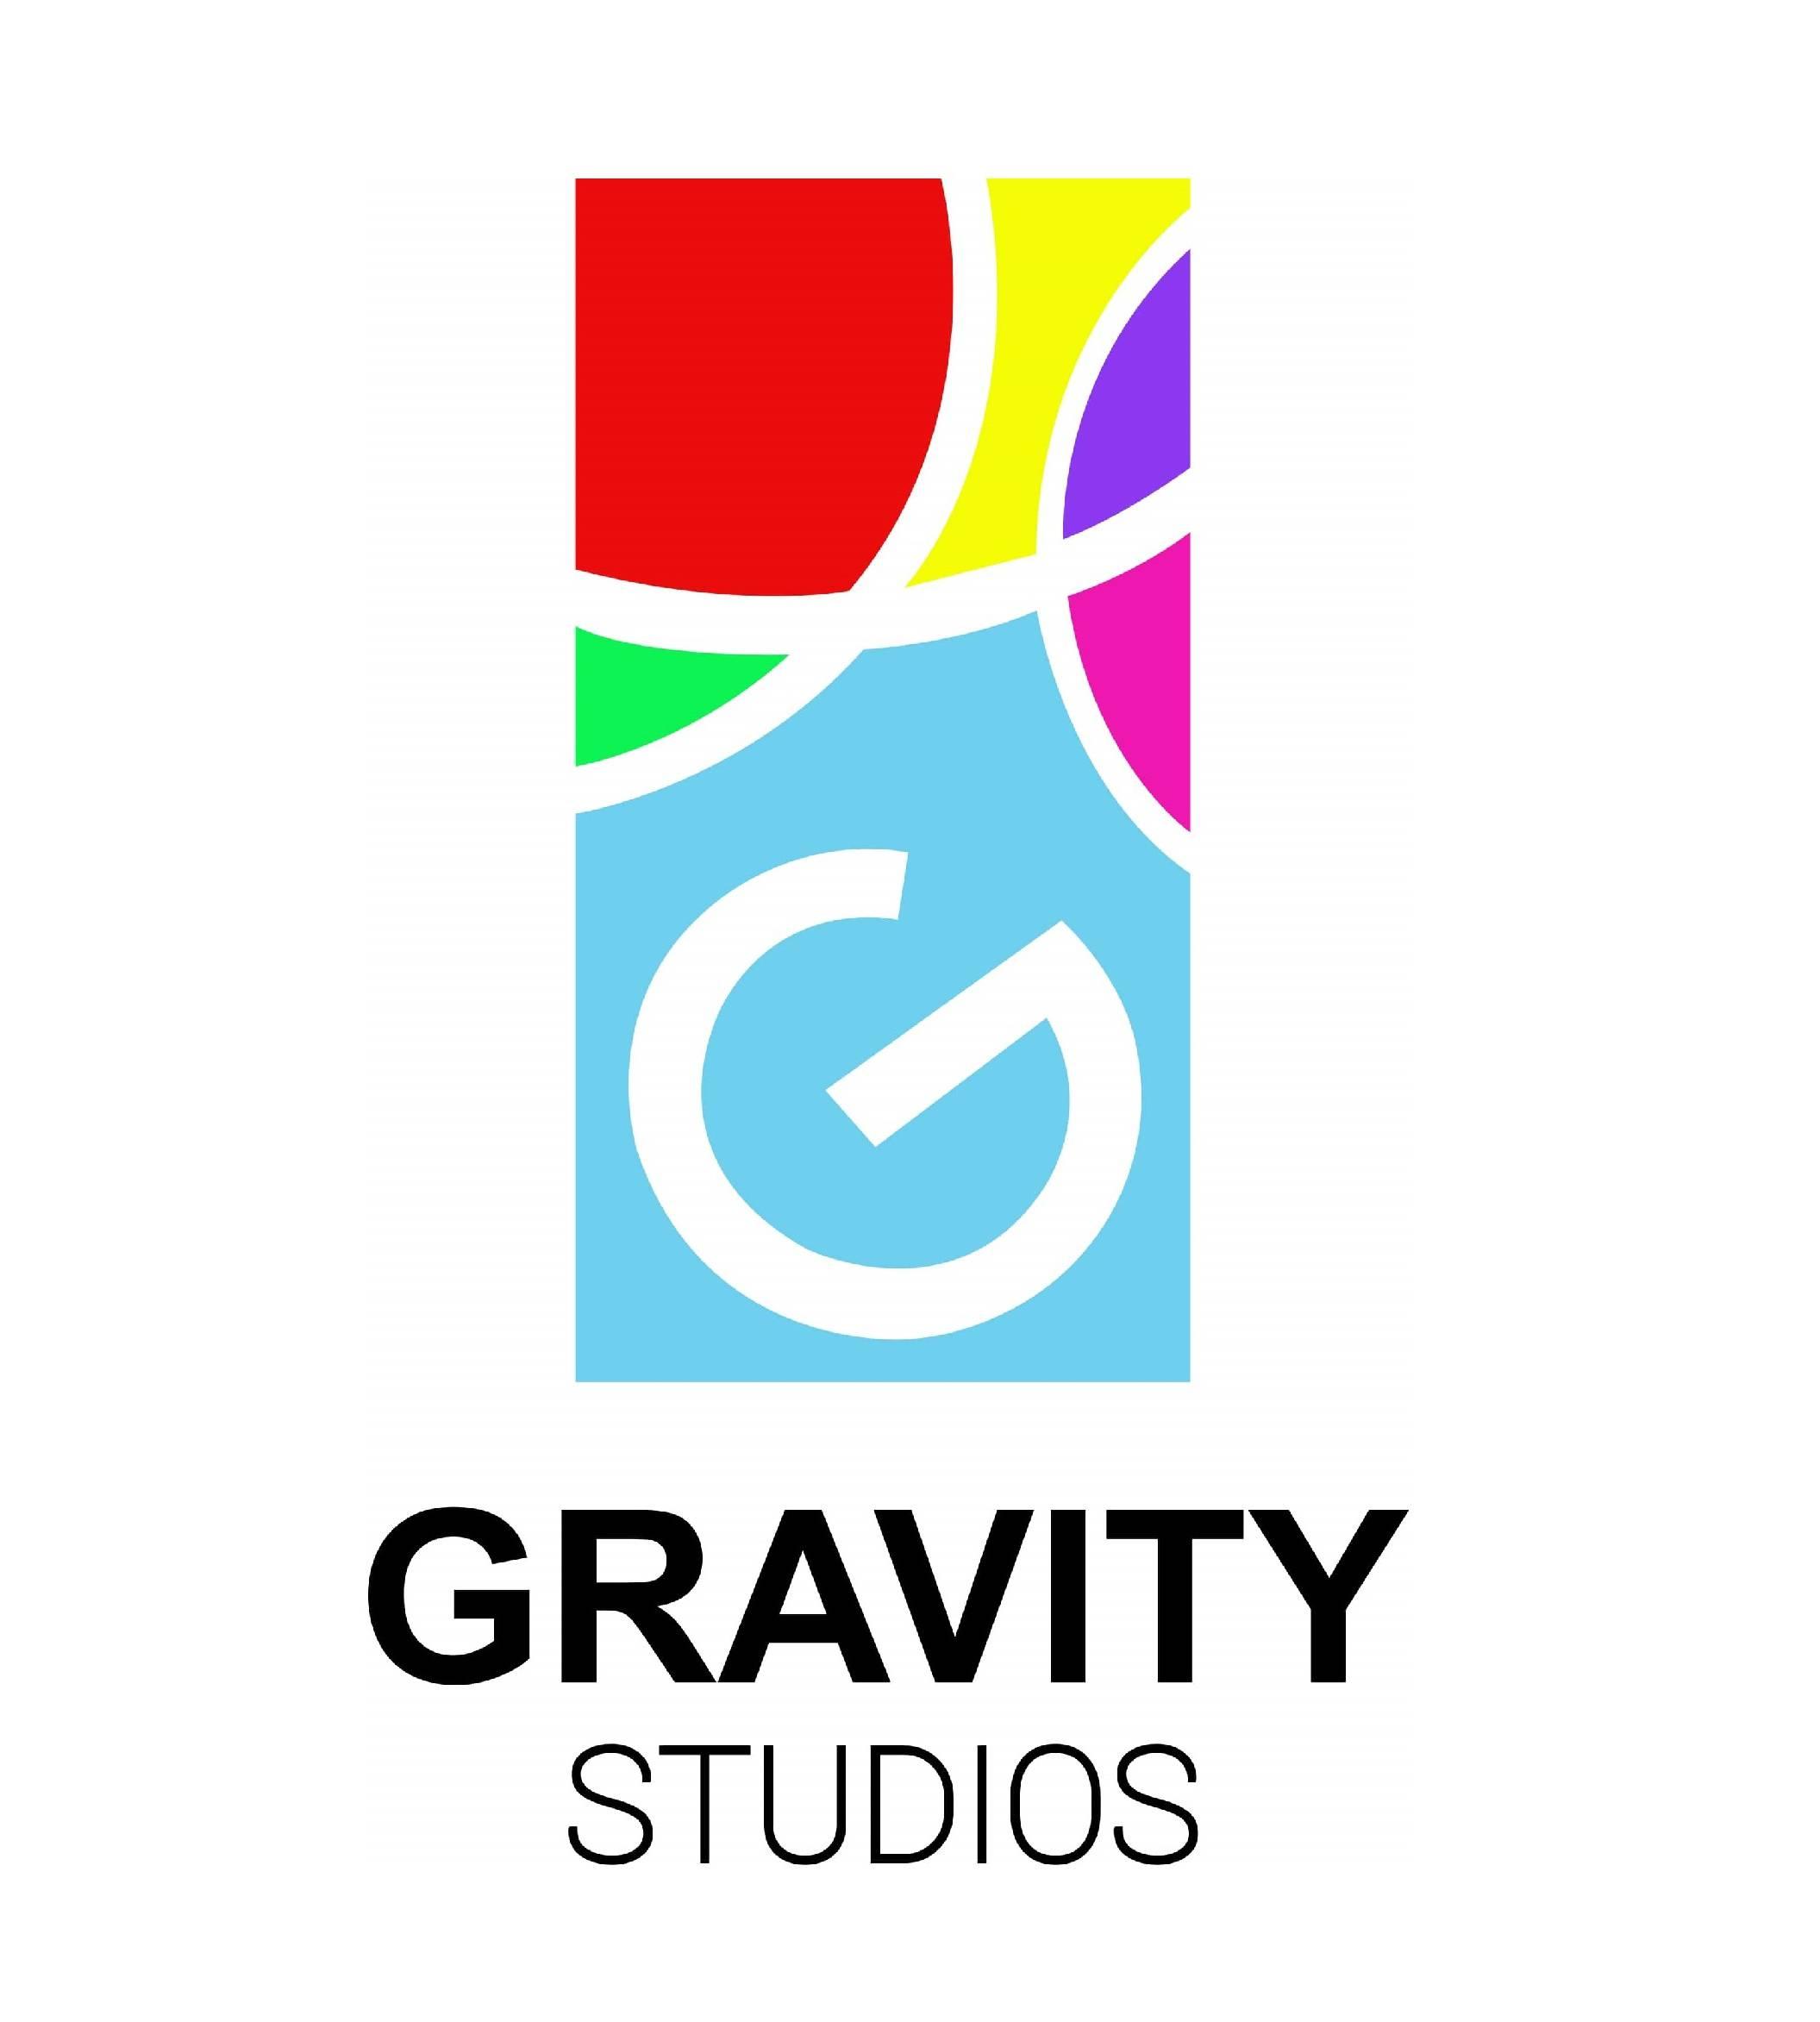 Gravity Studios Ltd